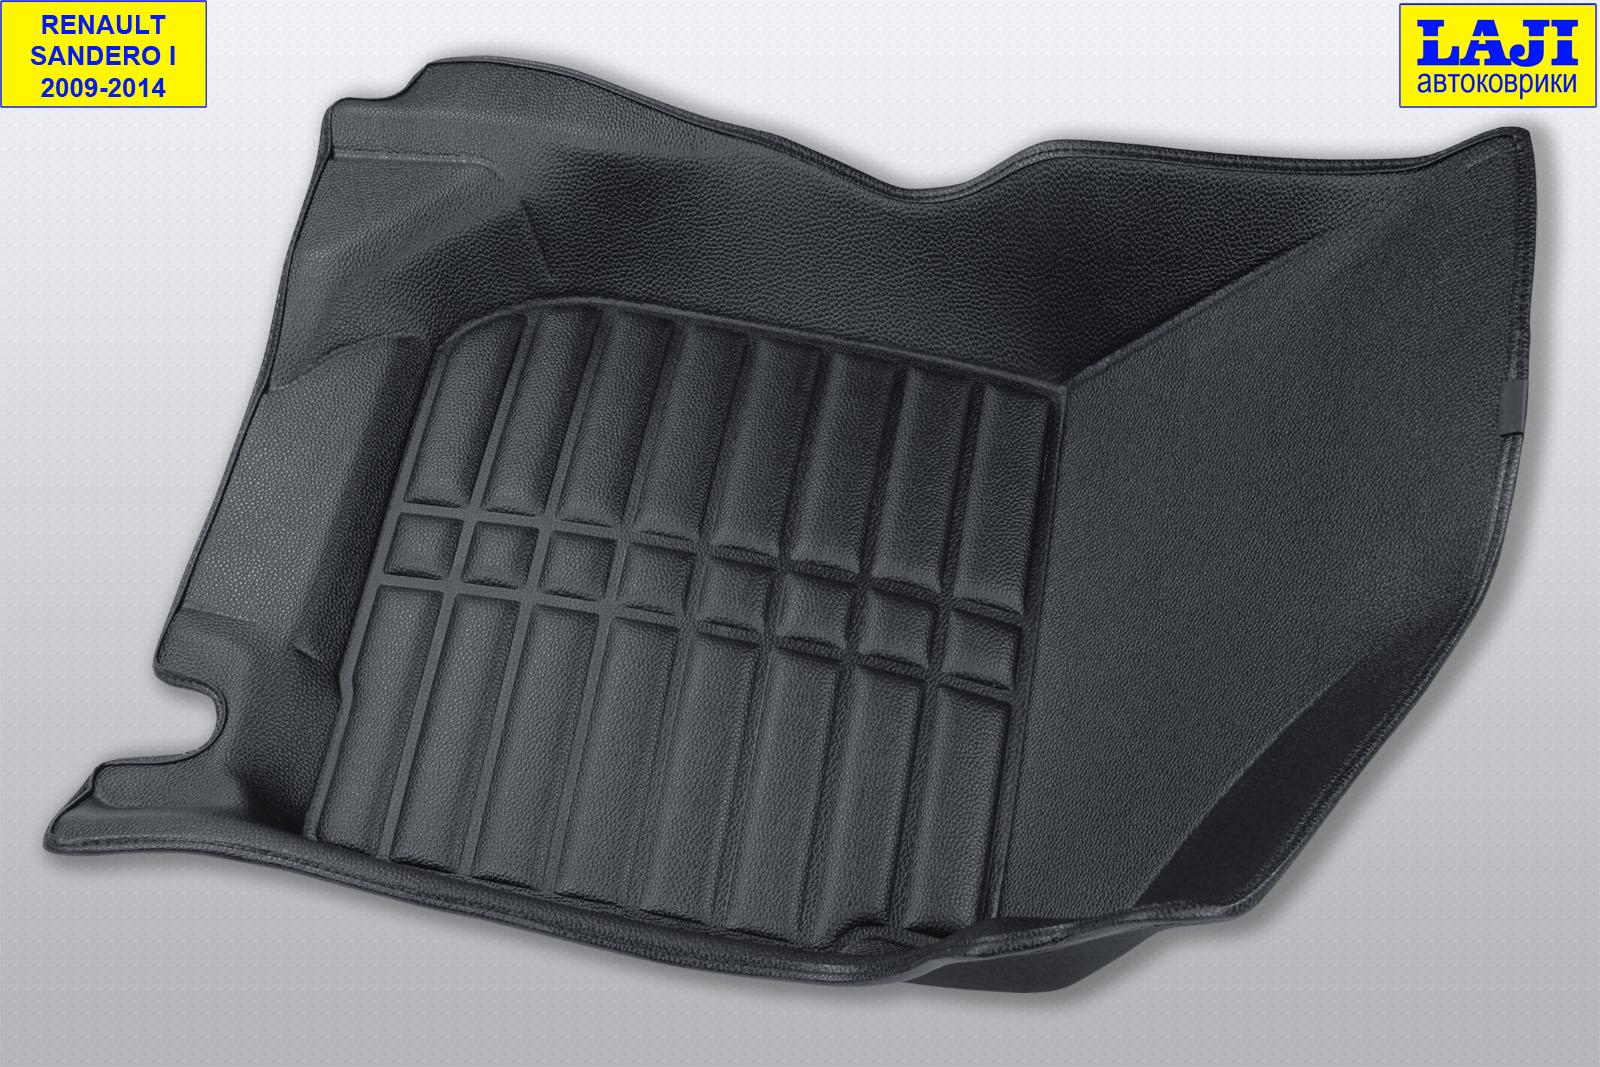 5D коврики в салон Renault Sandero 1 2009-2014 5